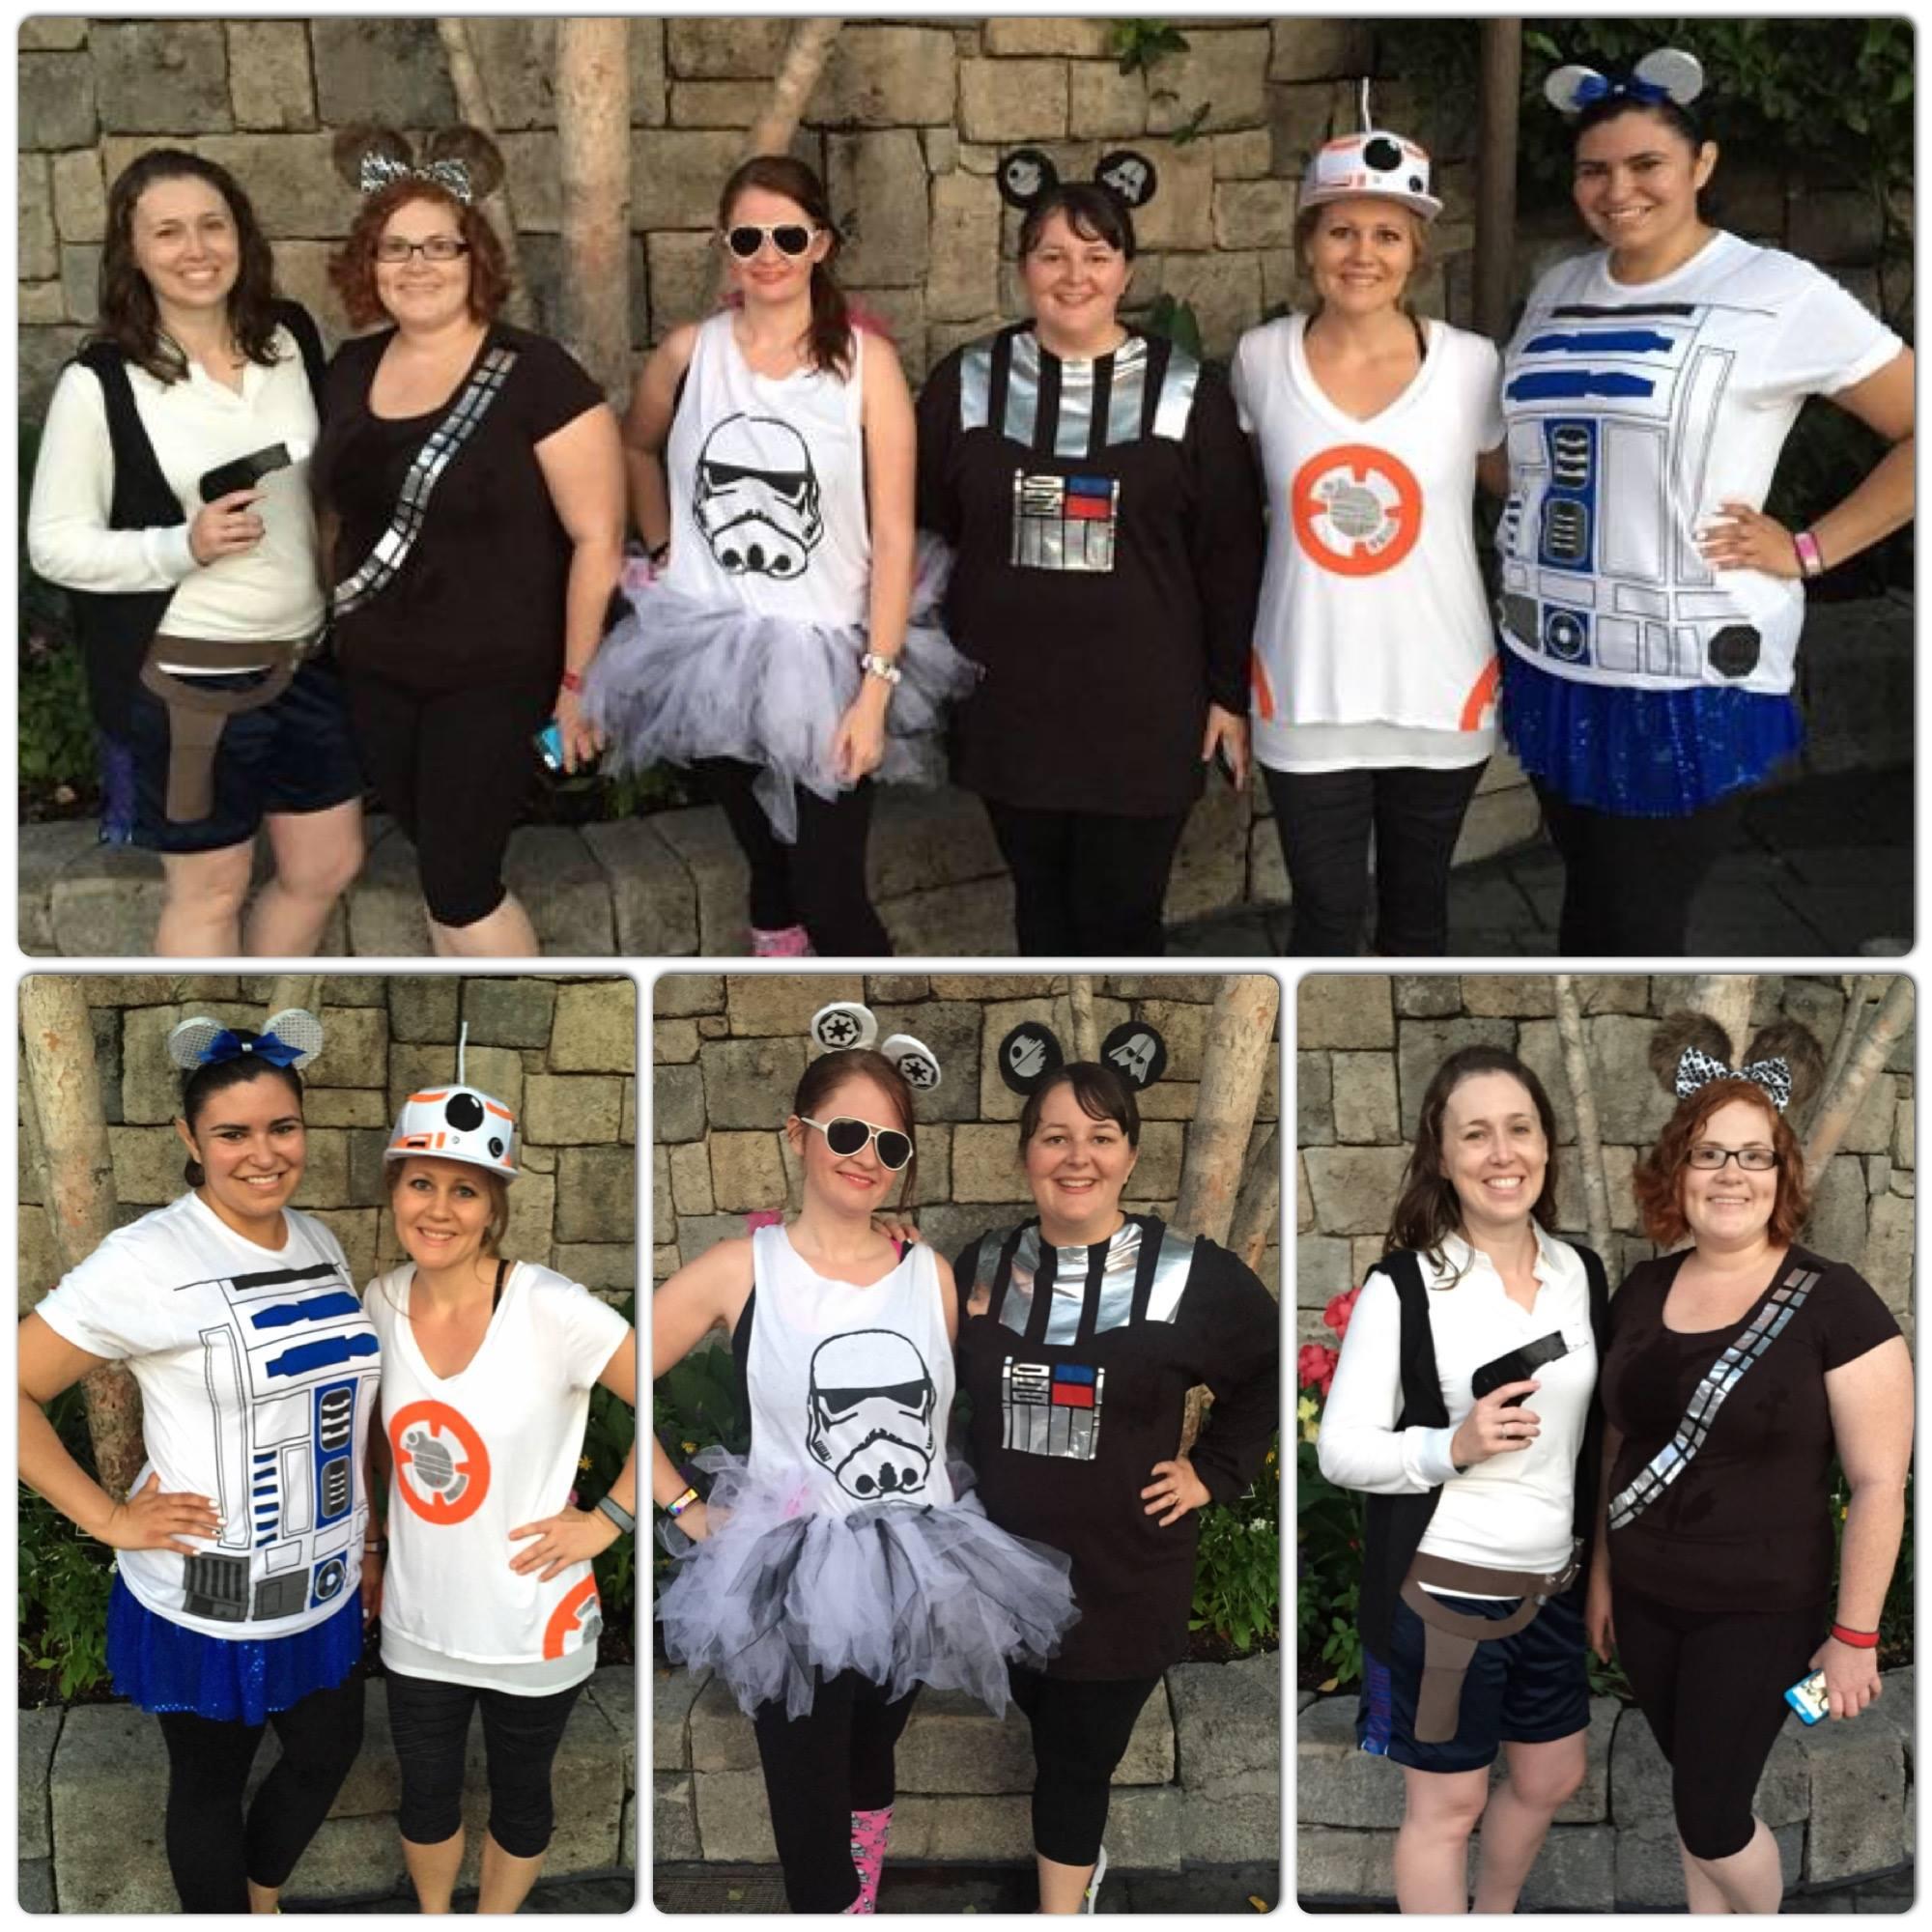 Star Wars Run Disney costume ideas